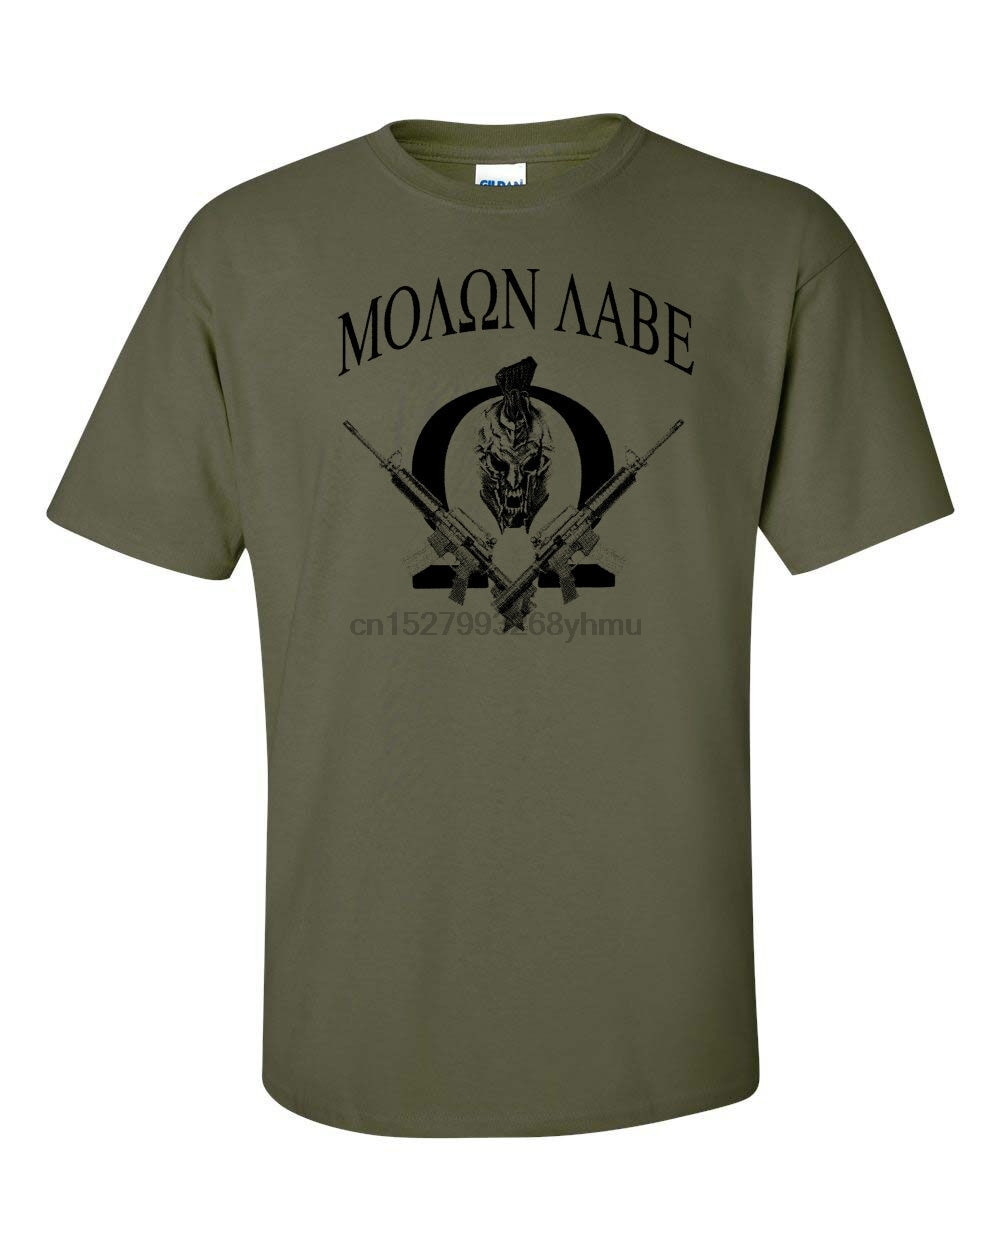 MOLON LABE Spartan Helmut AK15 Control de Armas segunda modificación hombres camiseta 894 (2)